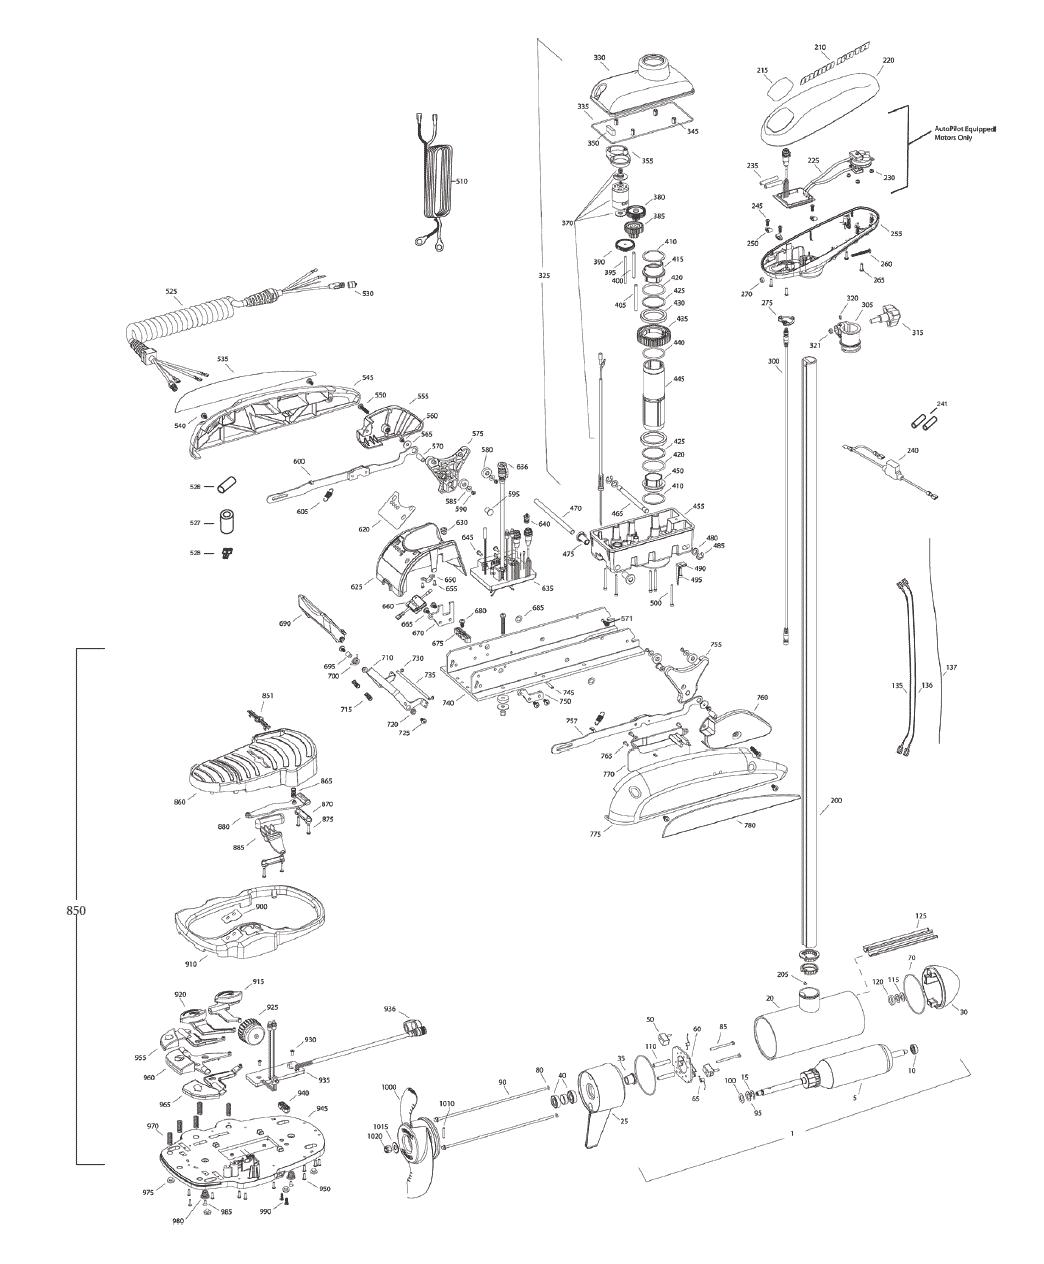 Minn Kota Vantage 80 Wiring Diagram